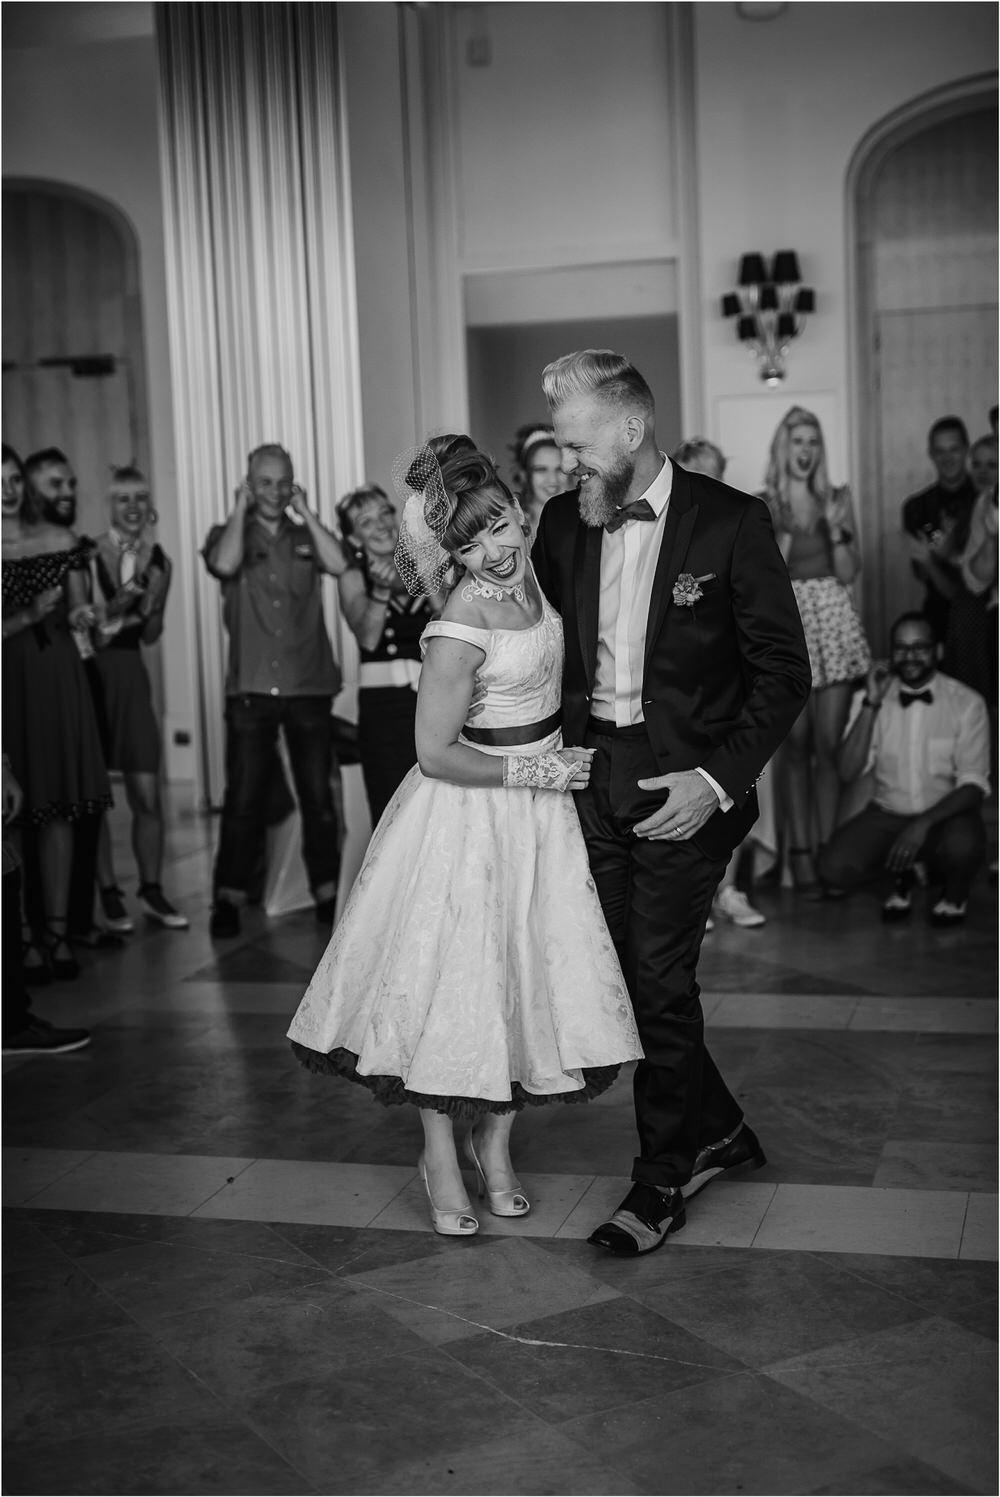 evian france wedding photographer photographer hotel royale rockabilly wedding poroka tematska nika grega themed wedding 0080.jpg